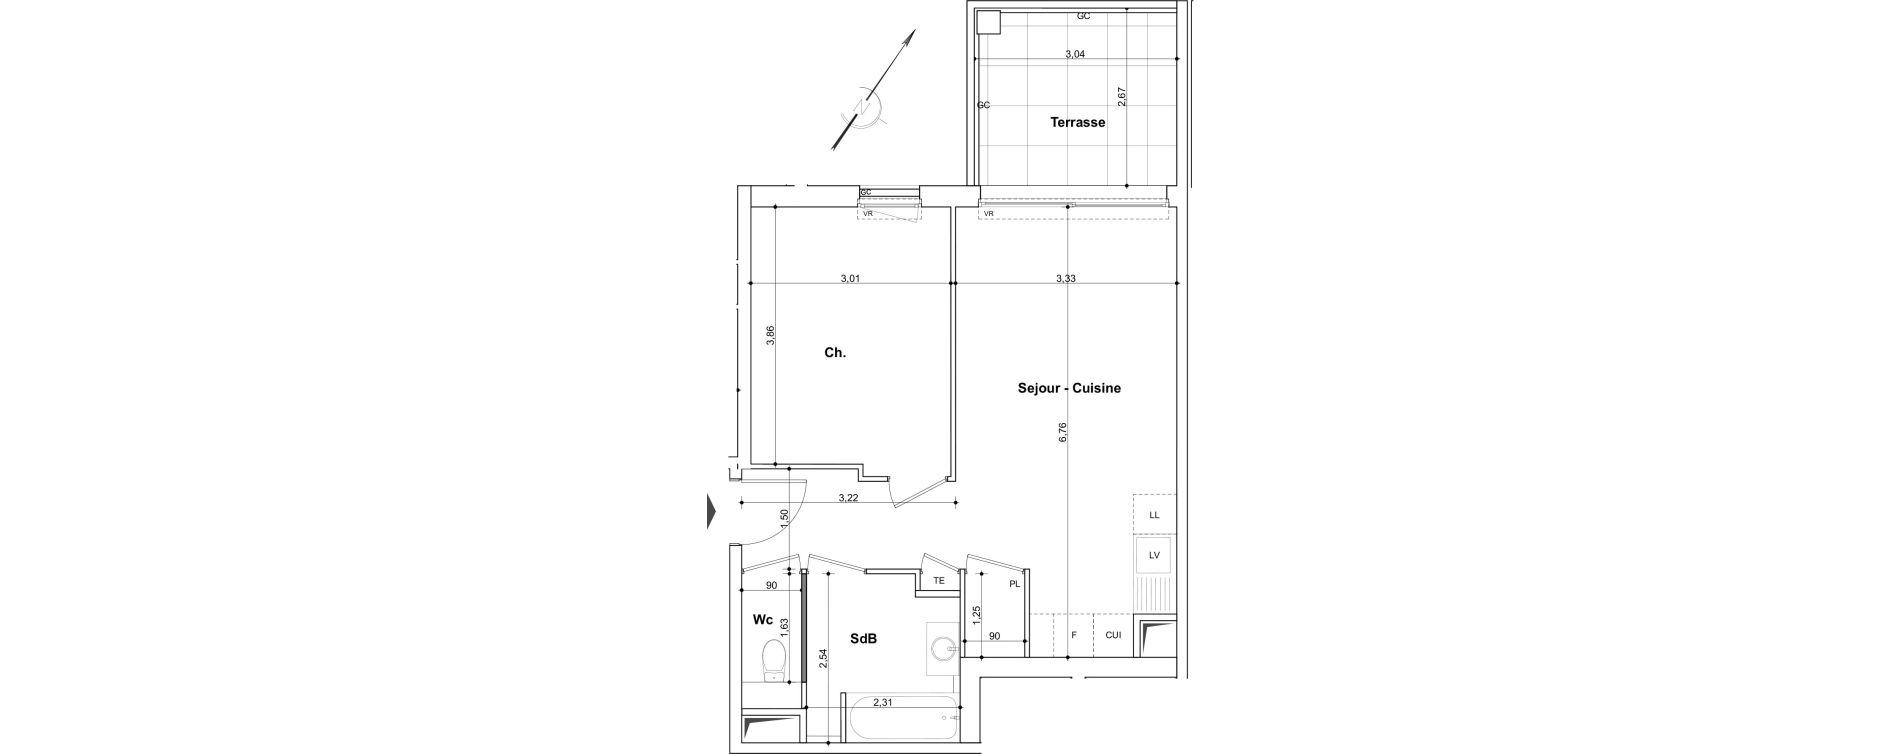 Appartement T2 de 45.22m2 1er étage NO Néo aIX Aix-en